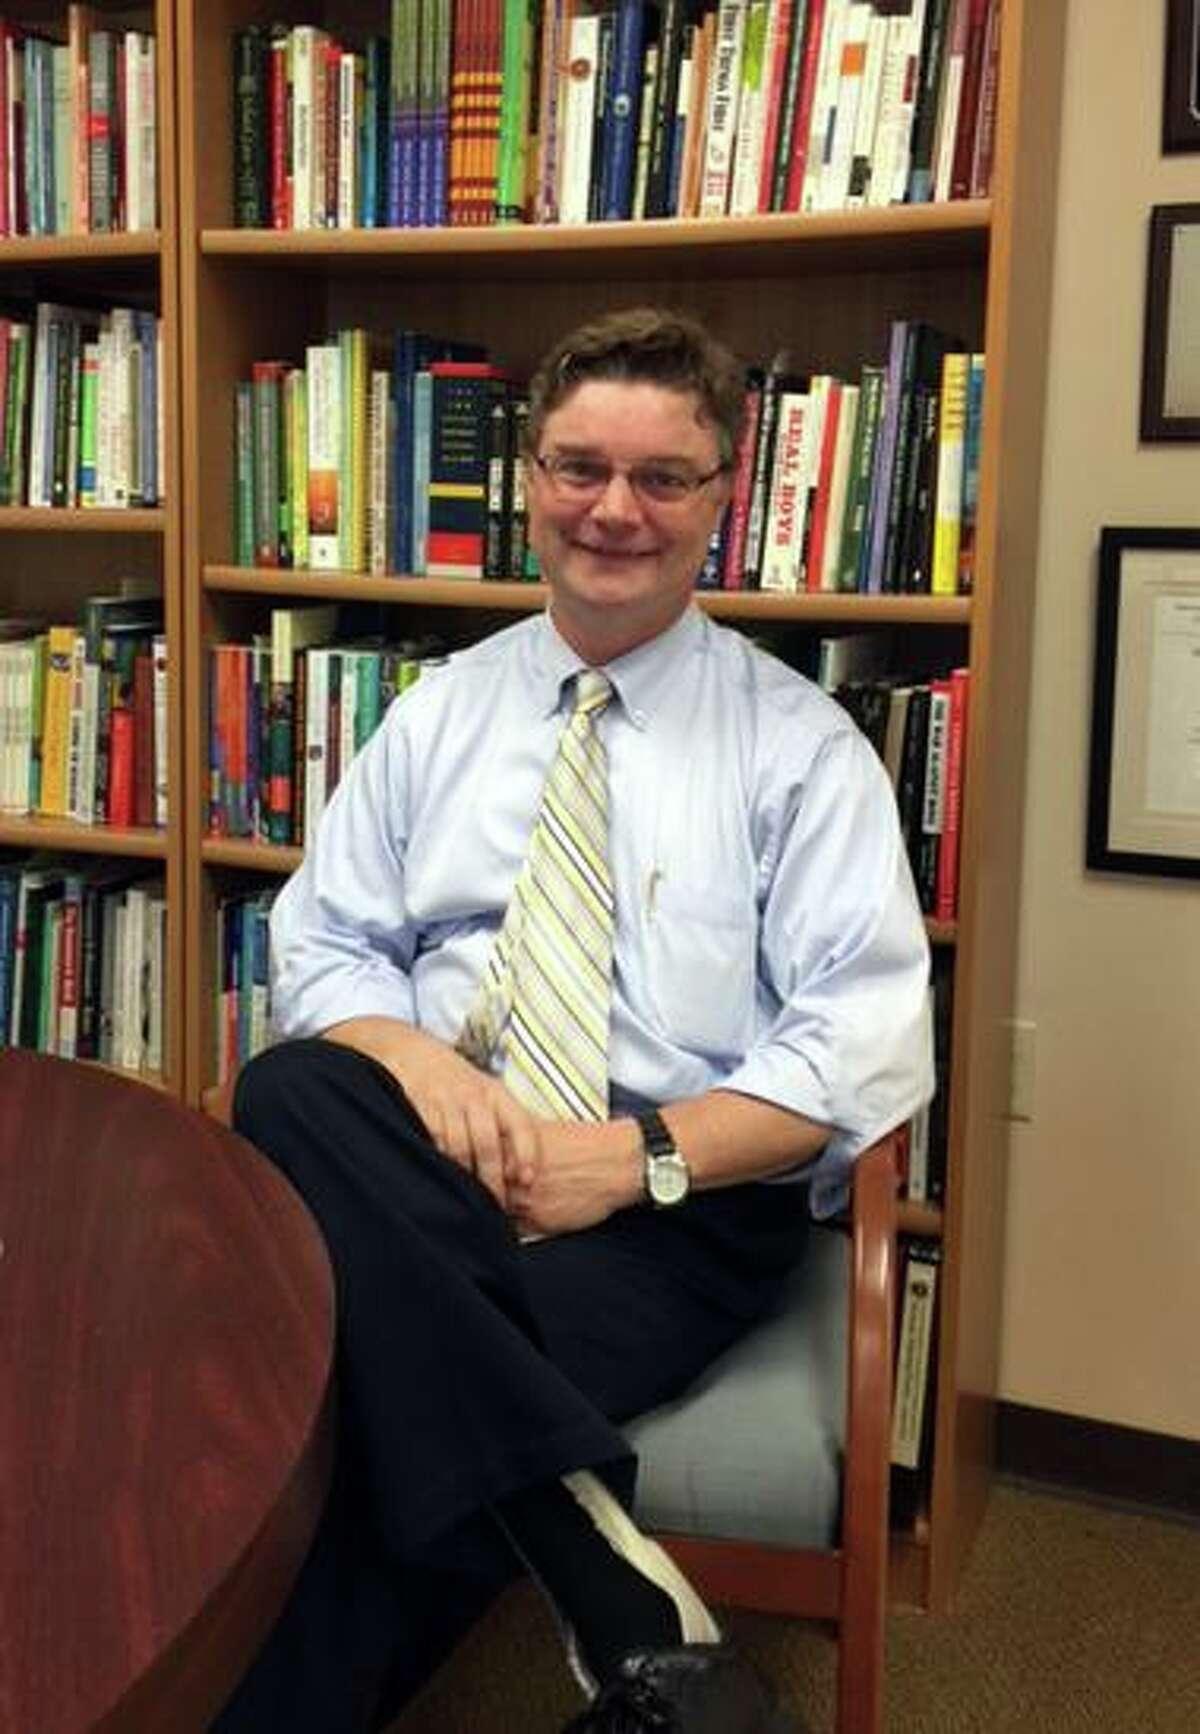 Dr. Thomas McMorran, superintendent for Easton, Redding and Region 9 schools.